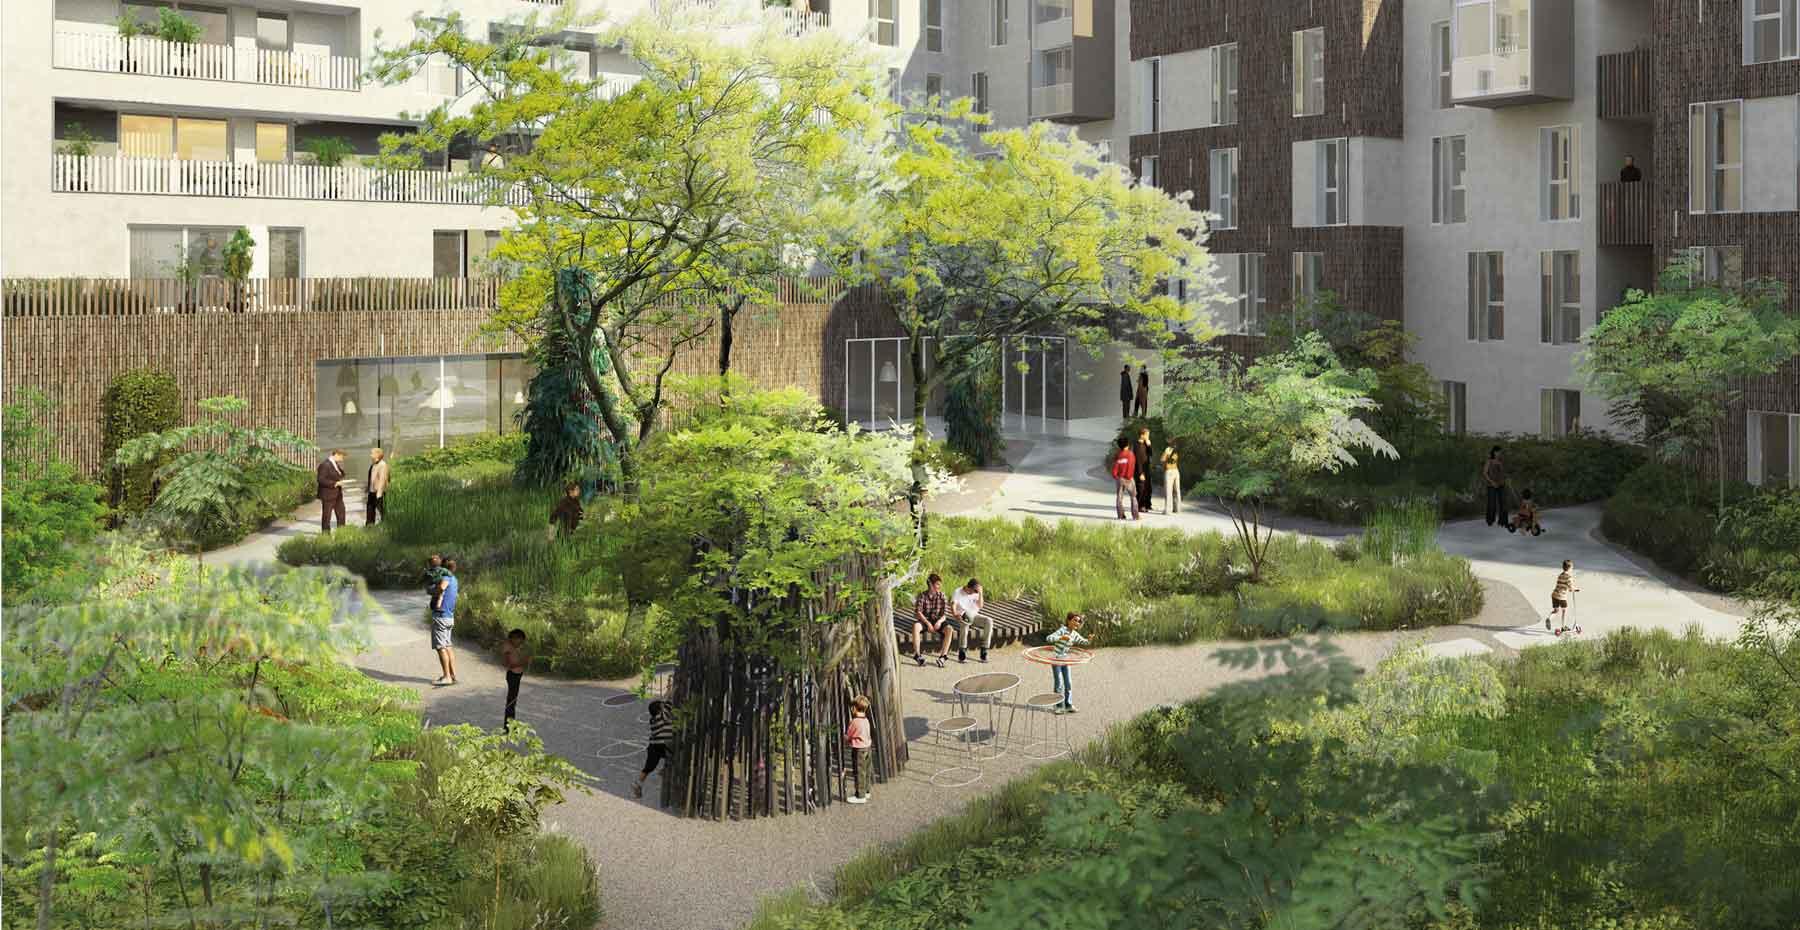 Jardin rhizome pantin seine saint denis forr - Deco jardin rouscht saint denis ...